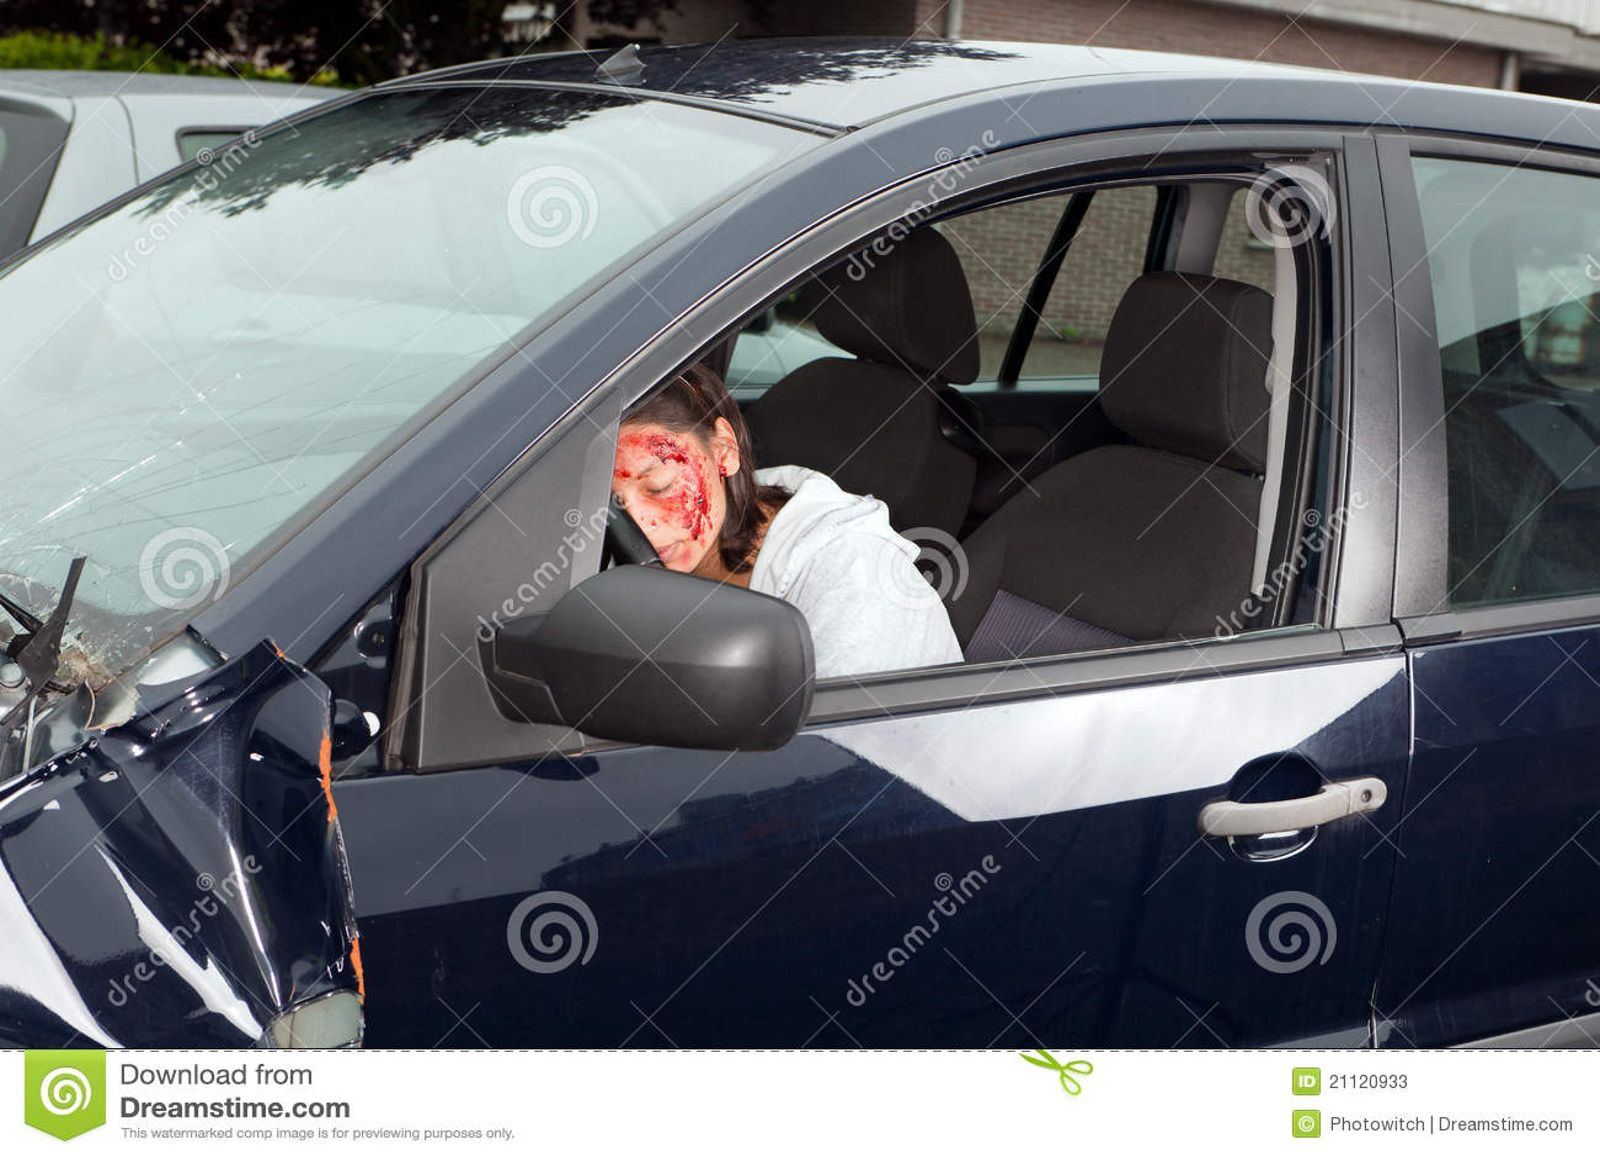 Trauma Car Crash Stock Photos - Image: 21120933